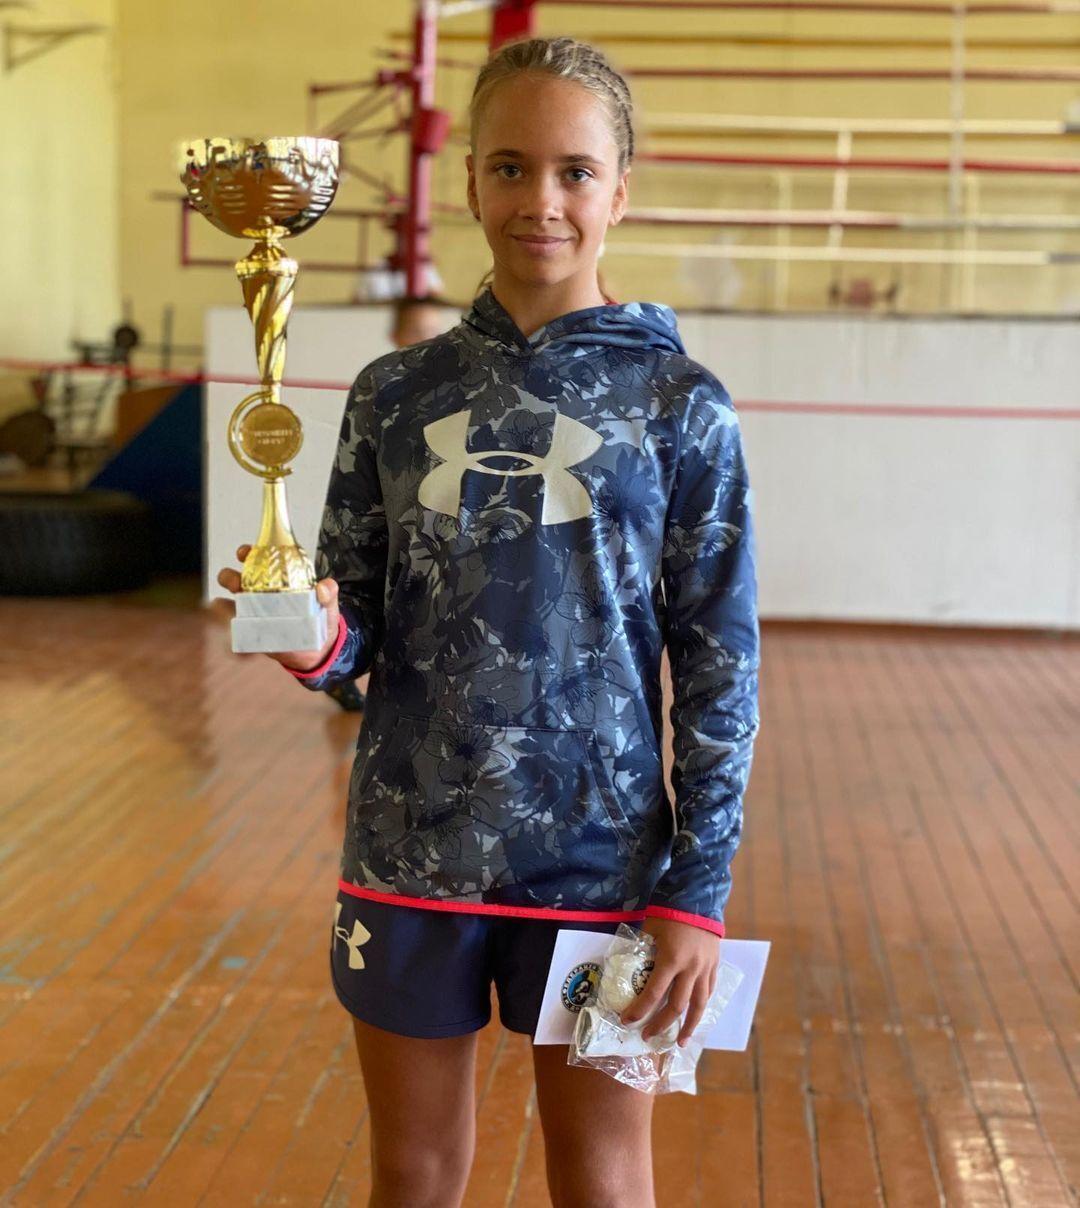 Кира Макогоненко выиграла Кубок Днепра